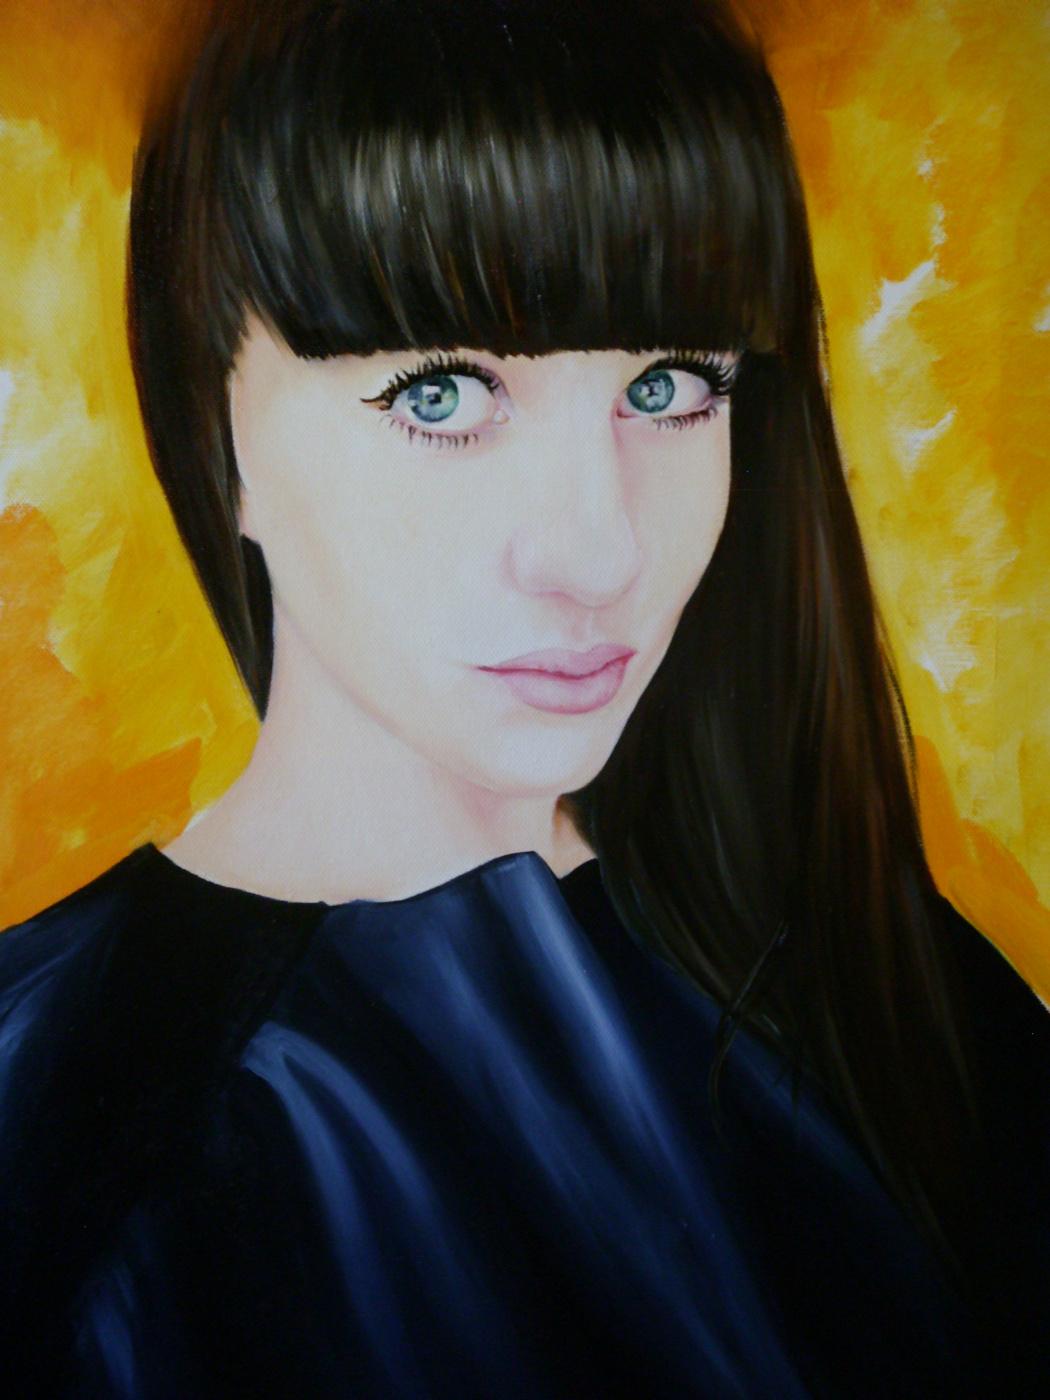 Хельга Эдуардовна Григорьева. Canvas, oil.